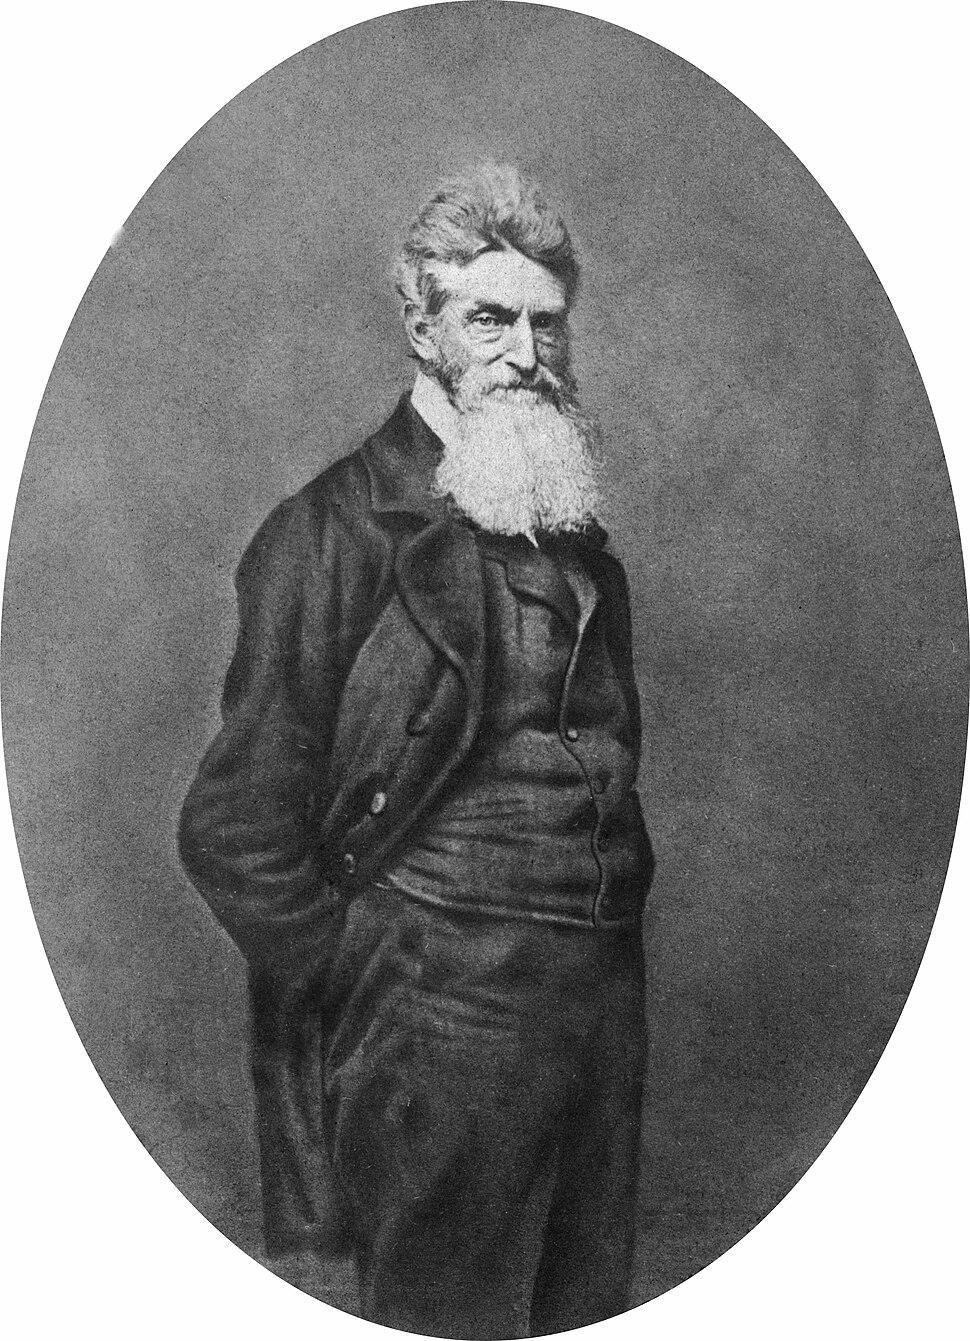 John Brown portrait, 1859